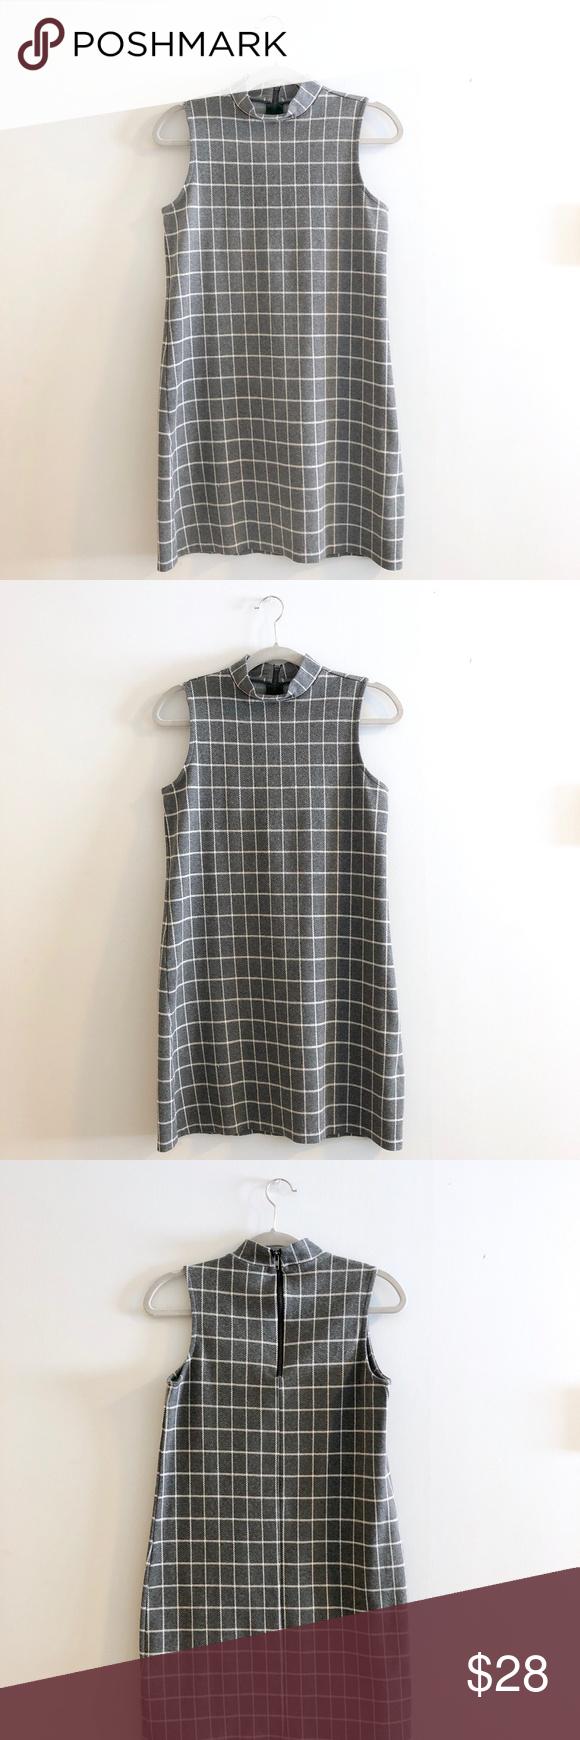 Paraphrase Gray Shift Dres Feature Mock Neck And Zipper Closure At Back Of Ma Grey Clothe Design Dress